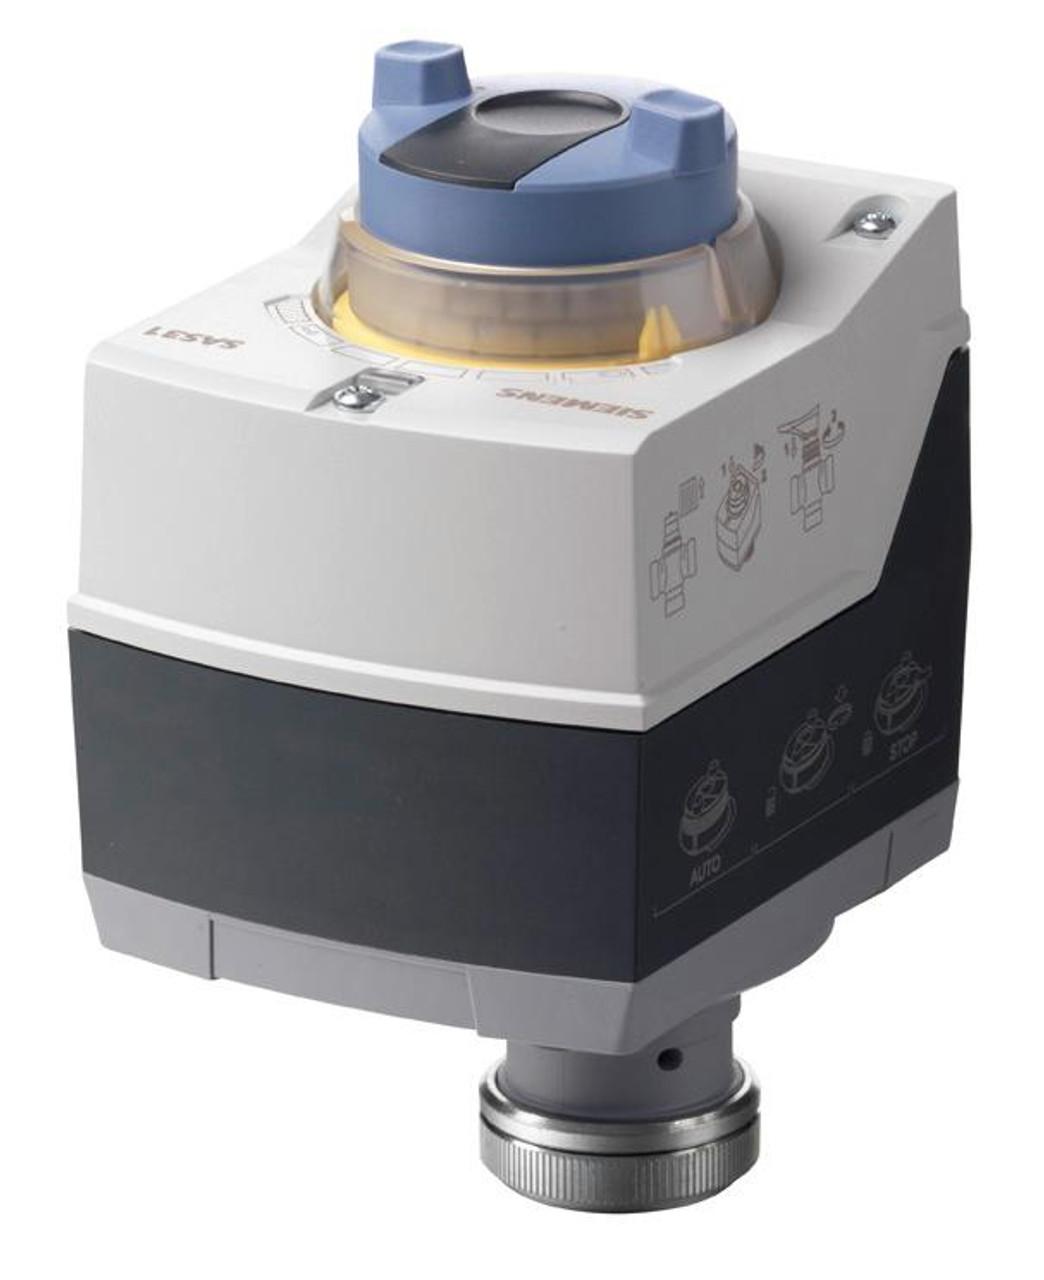 Siemens SAS61.03, electromotoric actuator, 400 N, S55158-A100